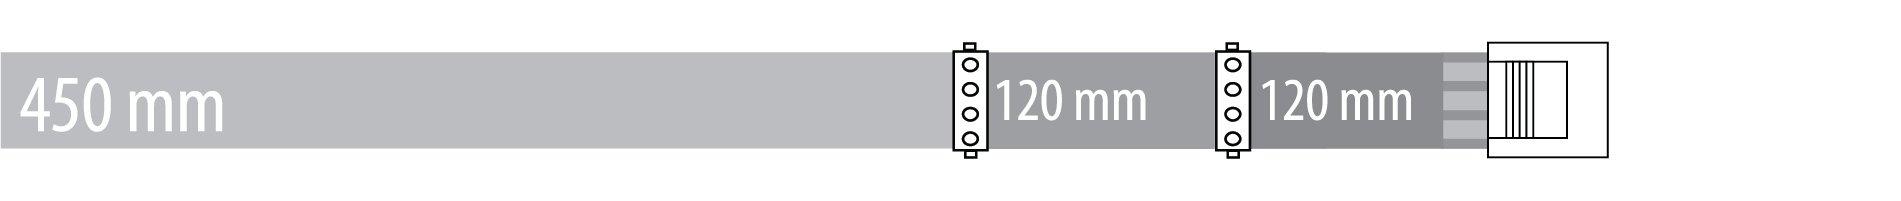 Peripheral 450 + 120 +120 mm